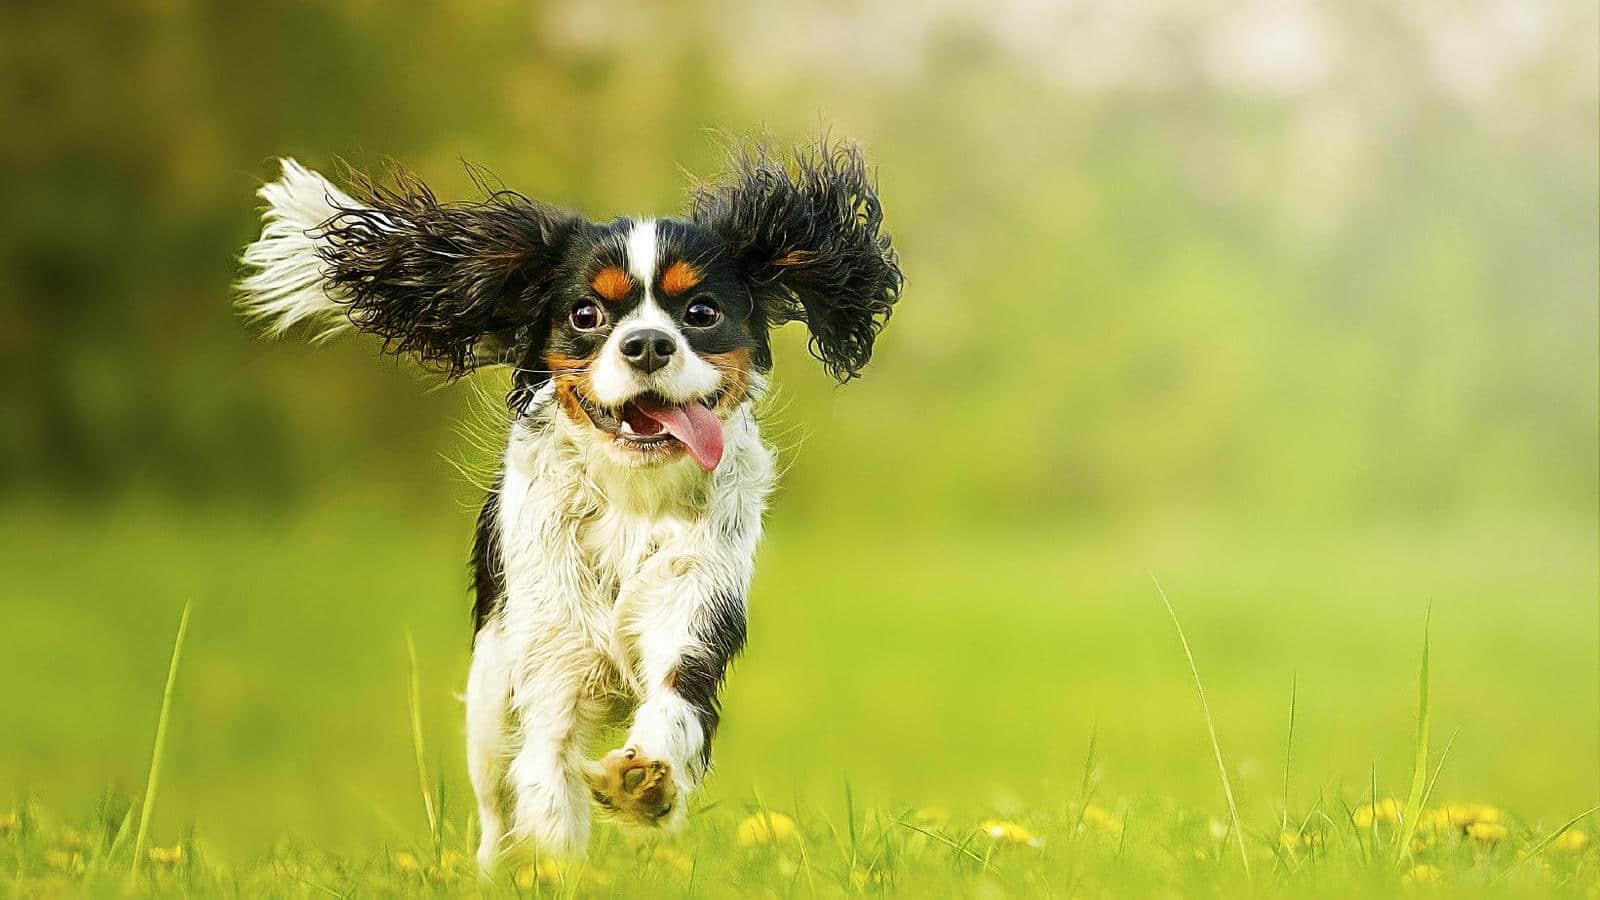 perro-corriendo-min1.jpg